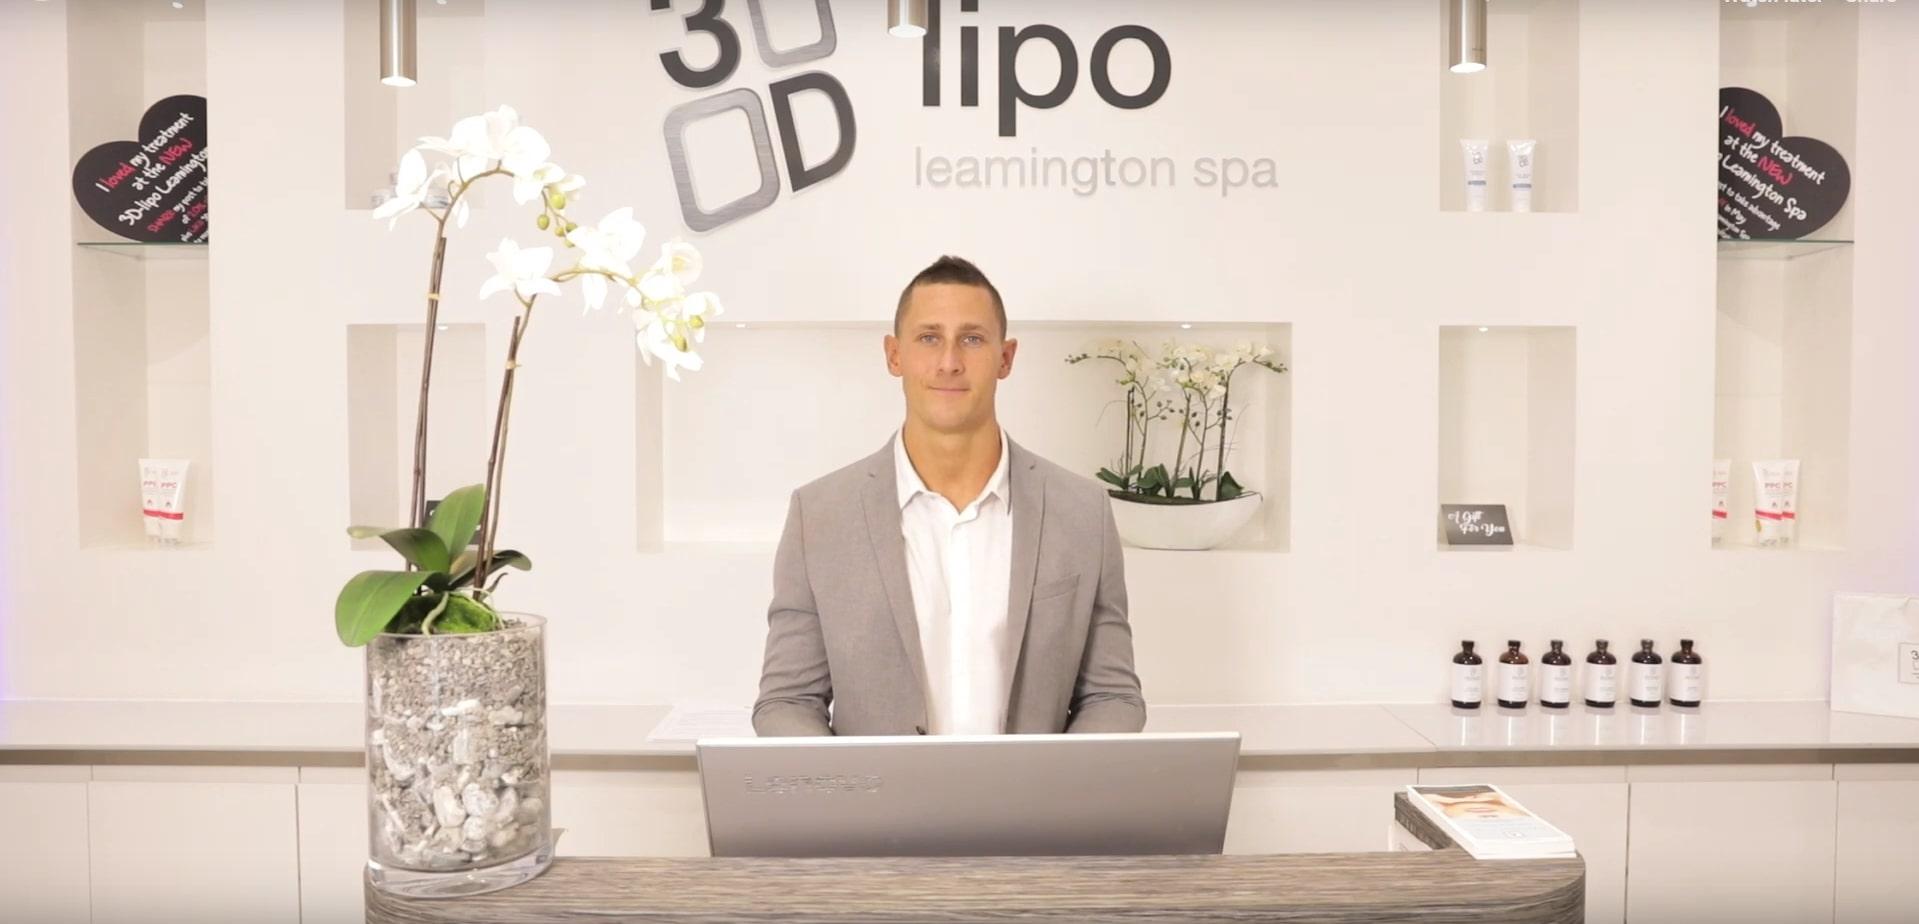 3d lipo clinic results